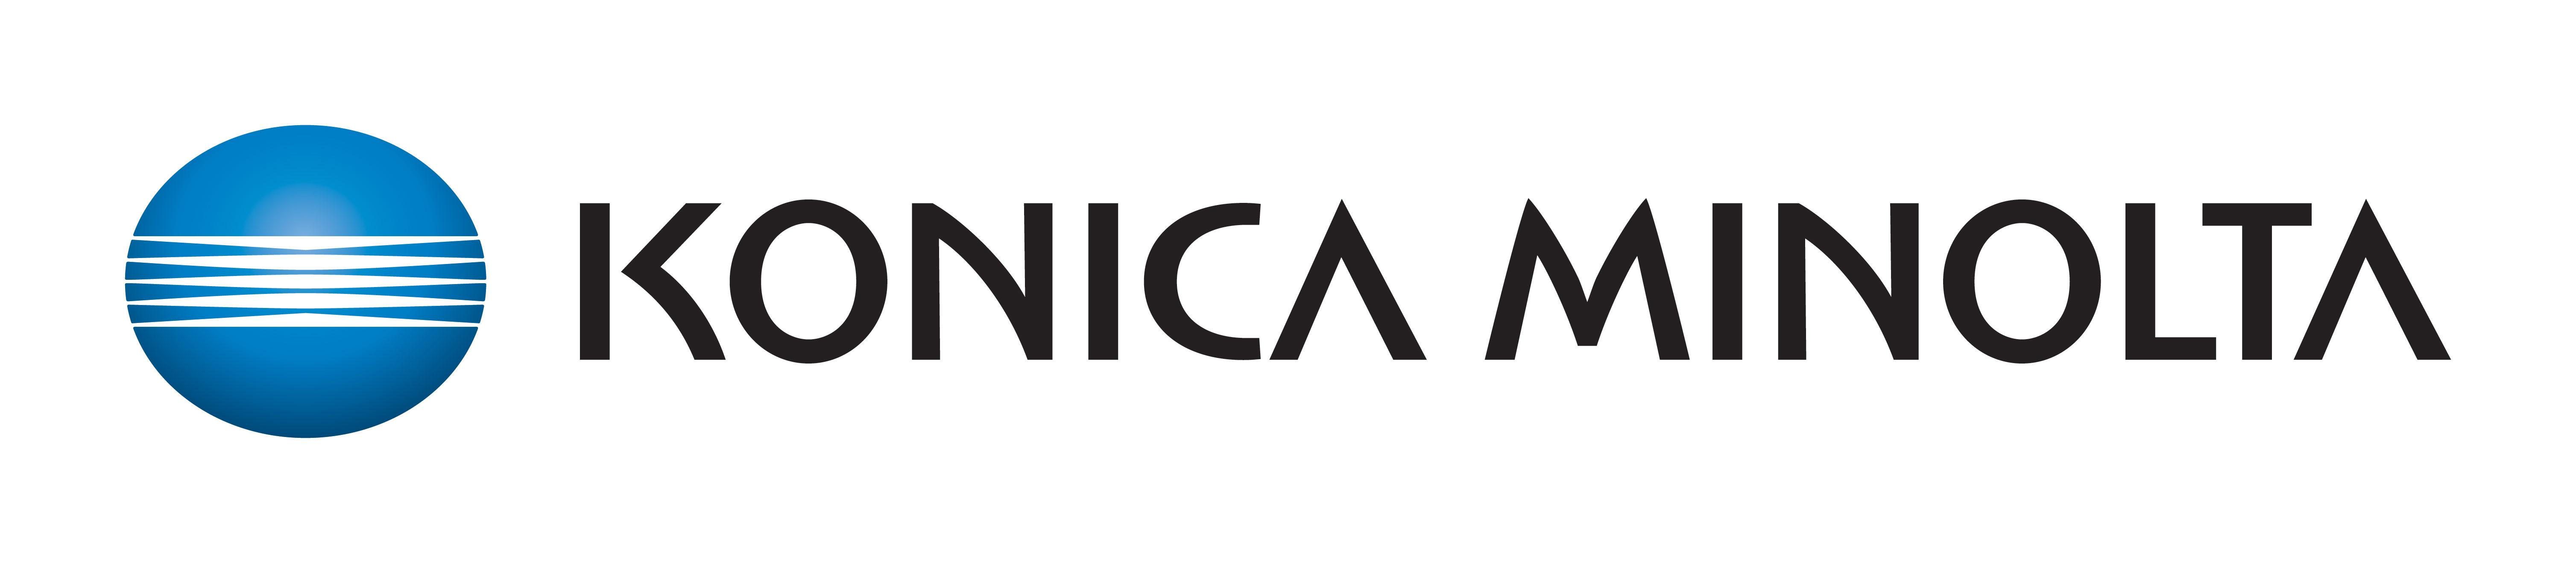 3D_Positive_Konica_Minolta_Horizontal_Logo